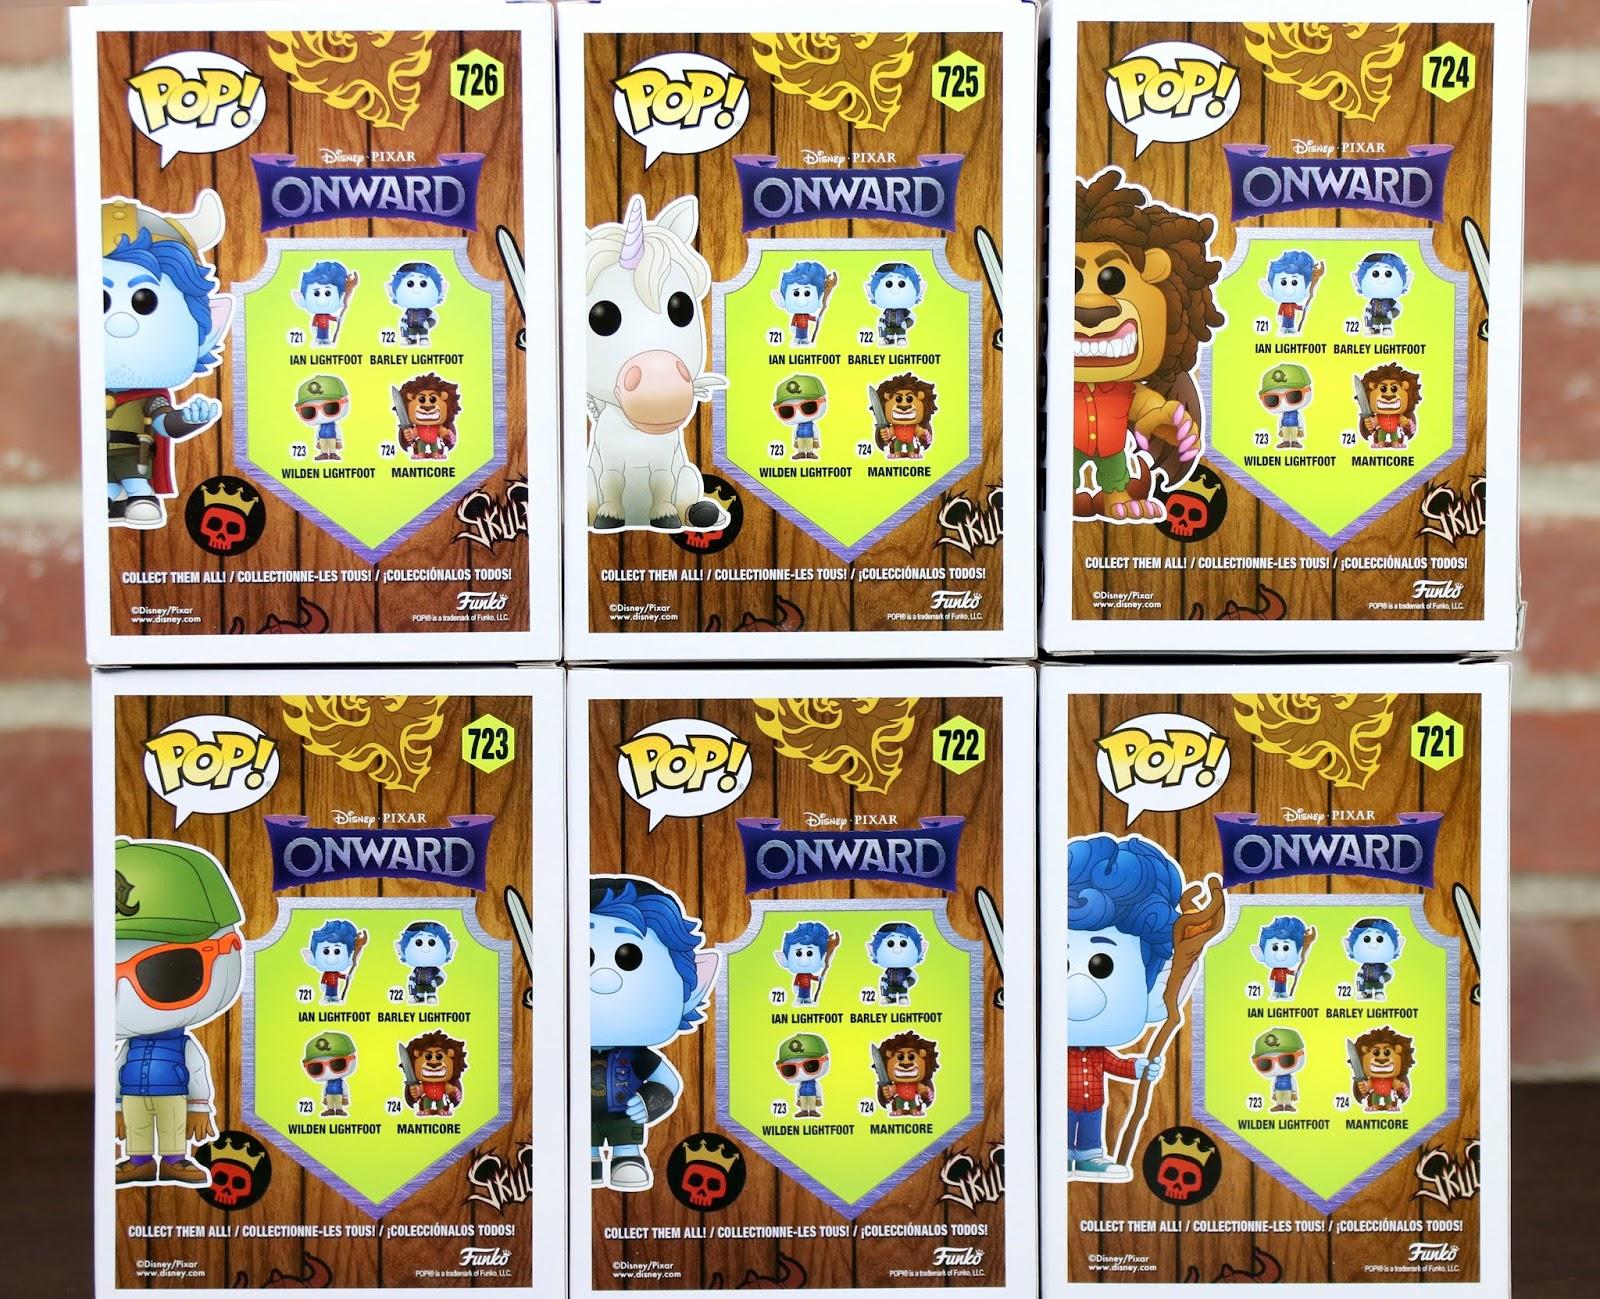 pixar onward funko pop collection